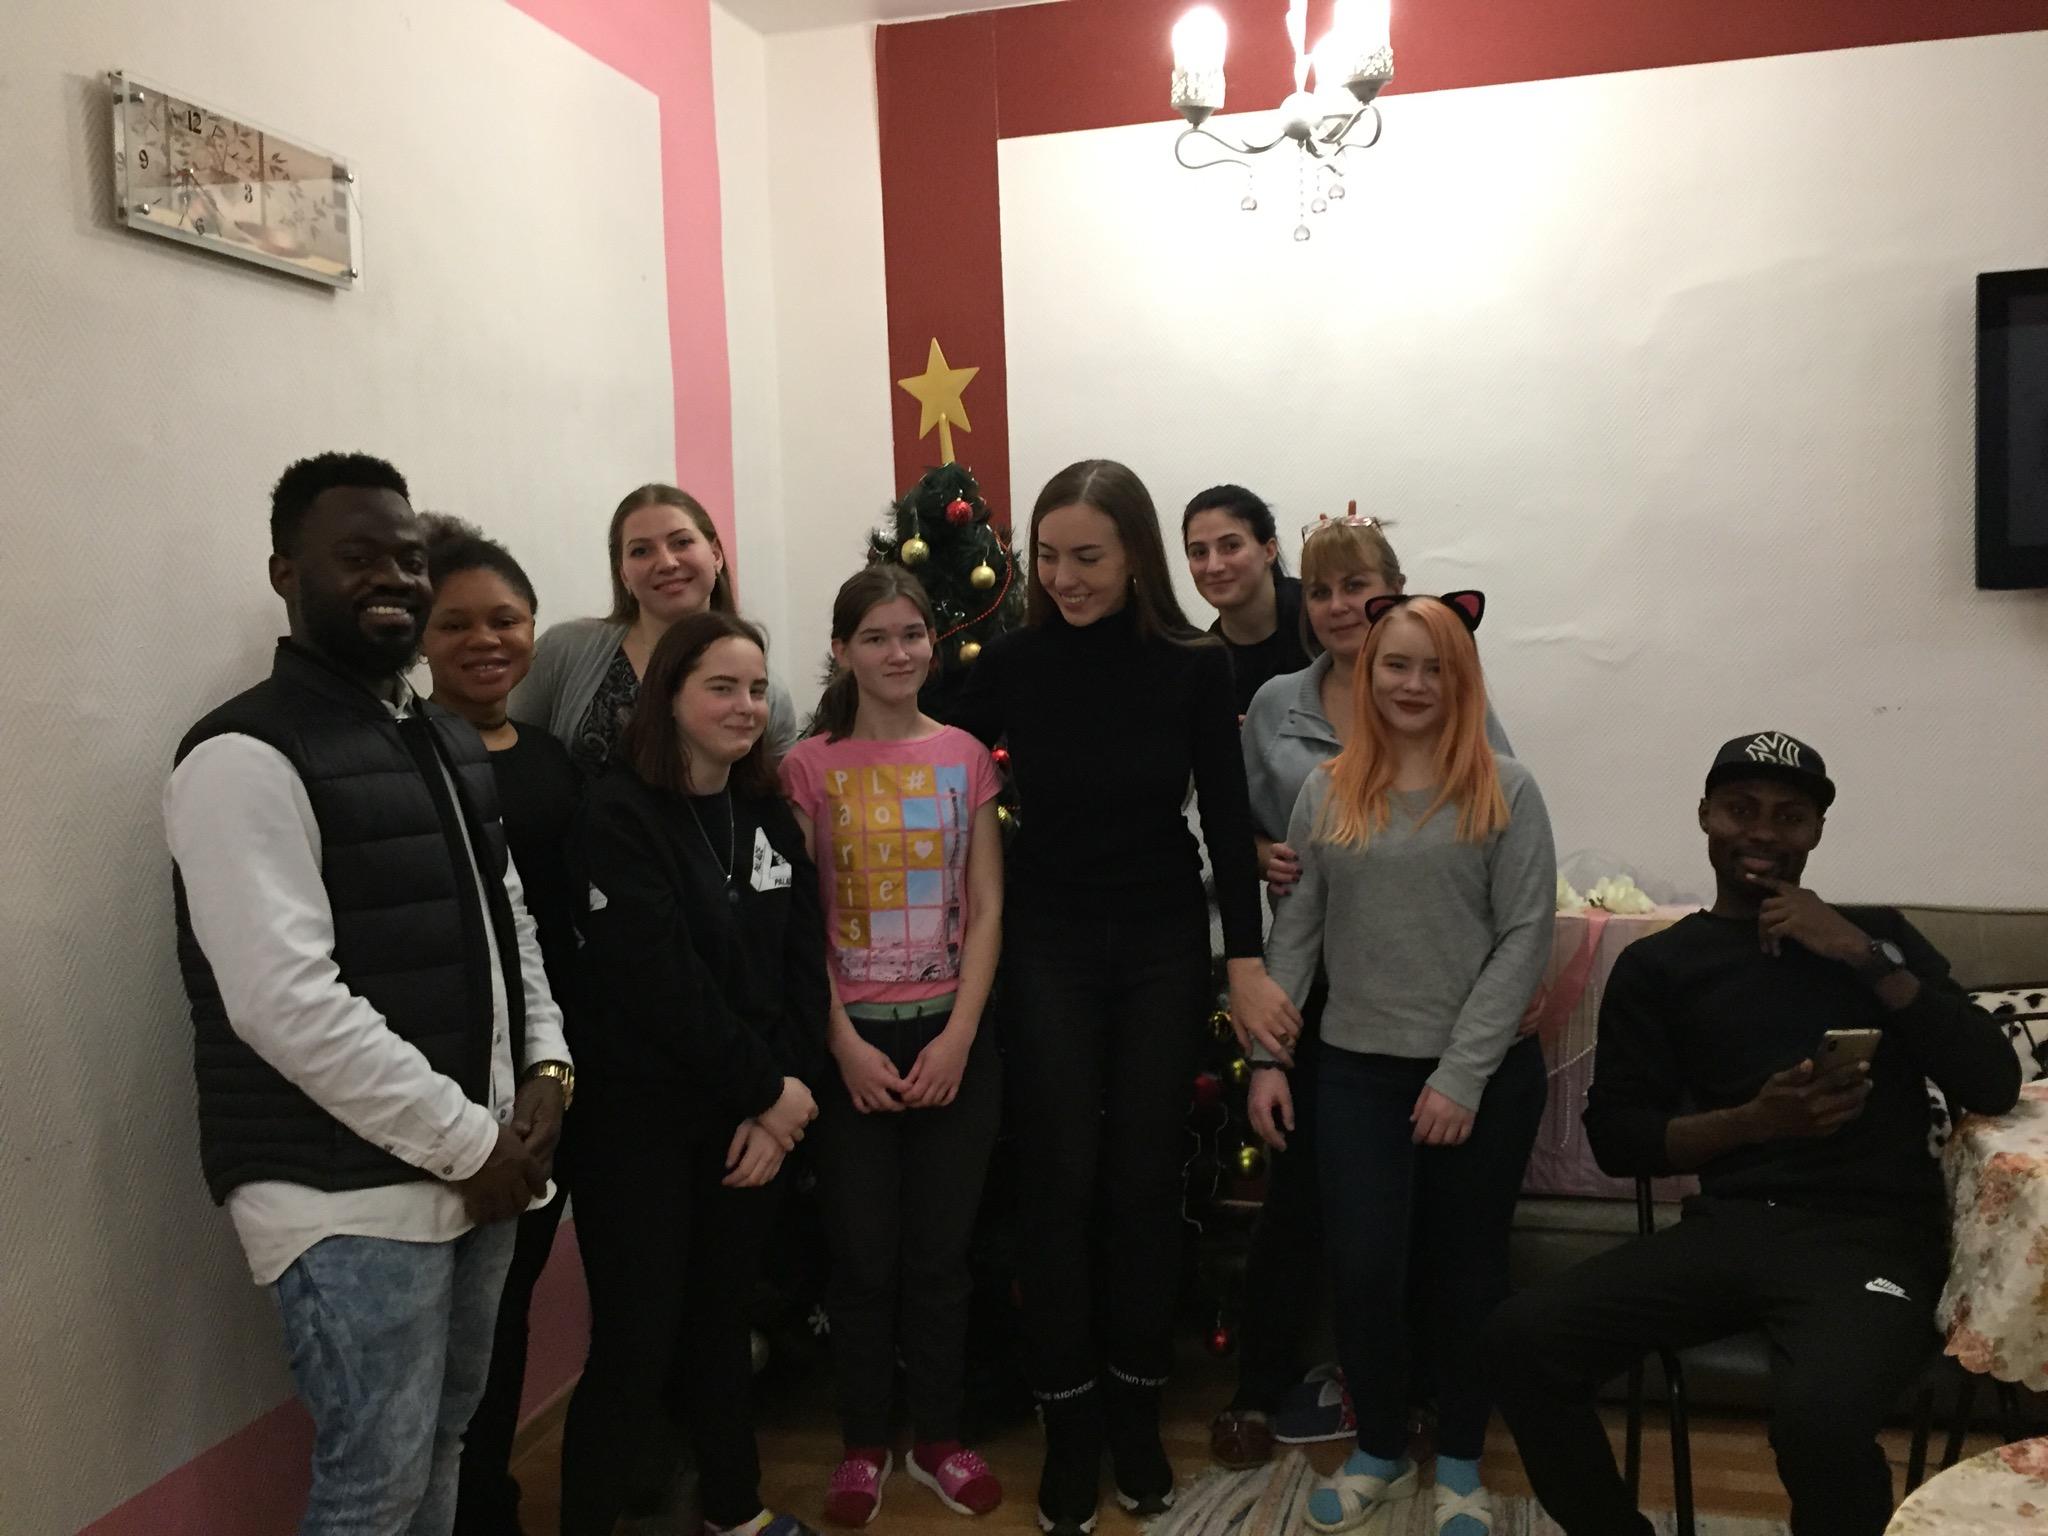 CE Saint-Petersburg, Russia went to